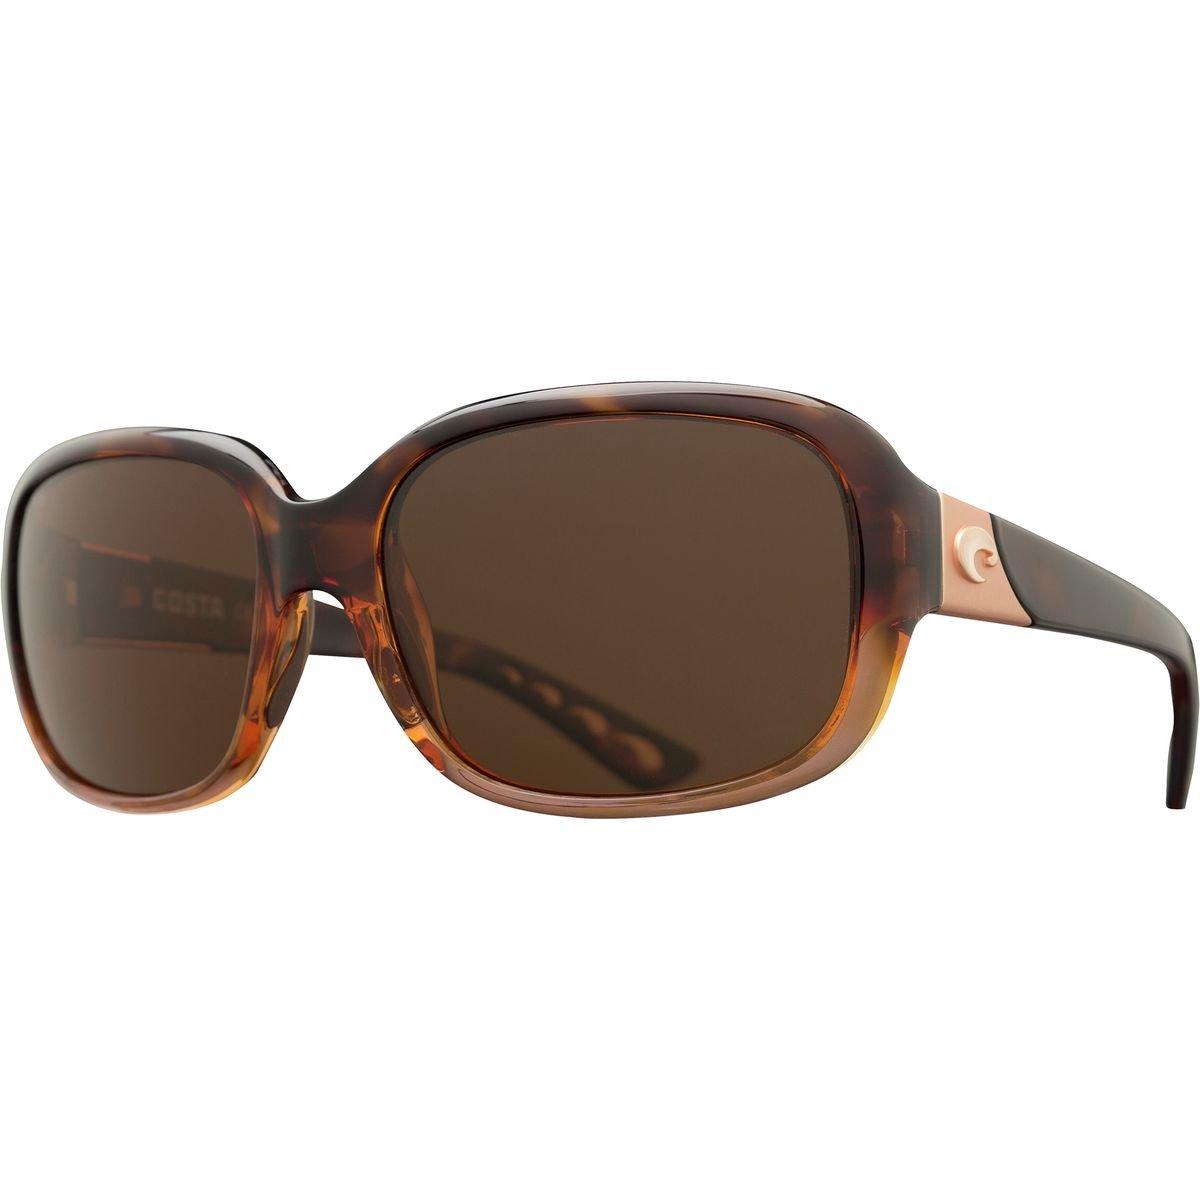 Costa Gannet 580 Women g Sunglasses Costa – Polarized One – Women 's B01N7WQF3K Shiny Tortoise Frame Fade Copper One Size, 人形堂:b32644ab --- verkokajak.se